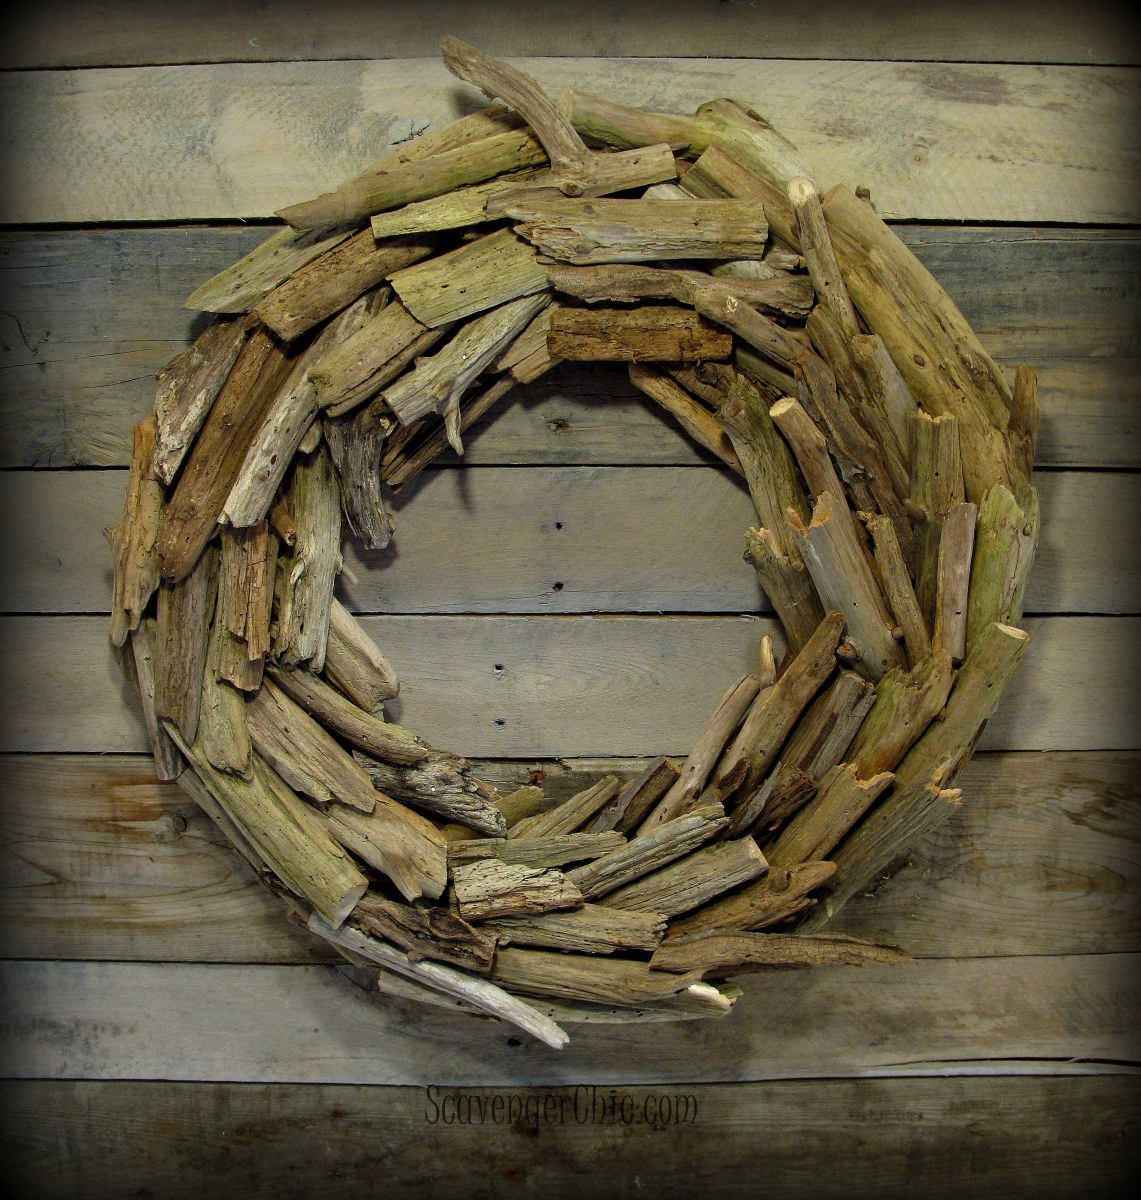 Driftwood Wreath Diy  Scavenger Chic. White Princess Quartzite. Standard 2 Car Garage Size. Kraftmaid Bathroom Vanity. Elephant Decor For Living Room. Outdoor Bar Stool. Detroit Stone. Bathtub With Jets. Alcohol Bar